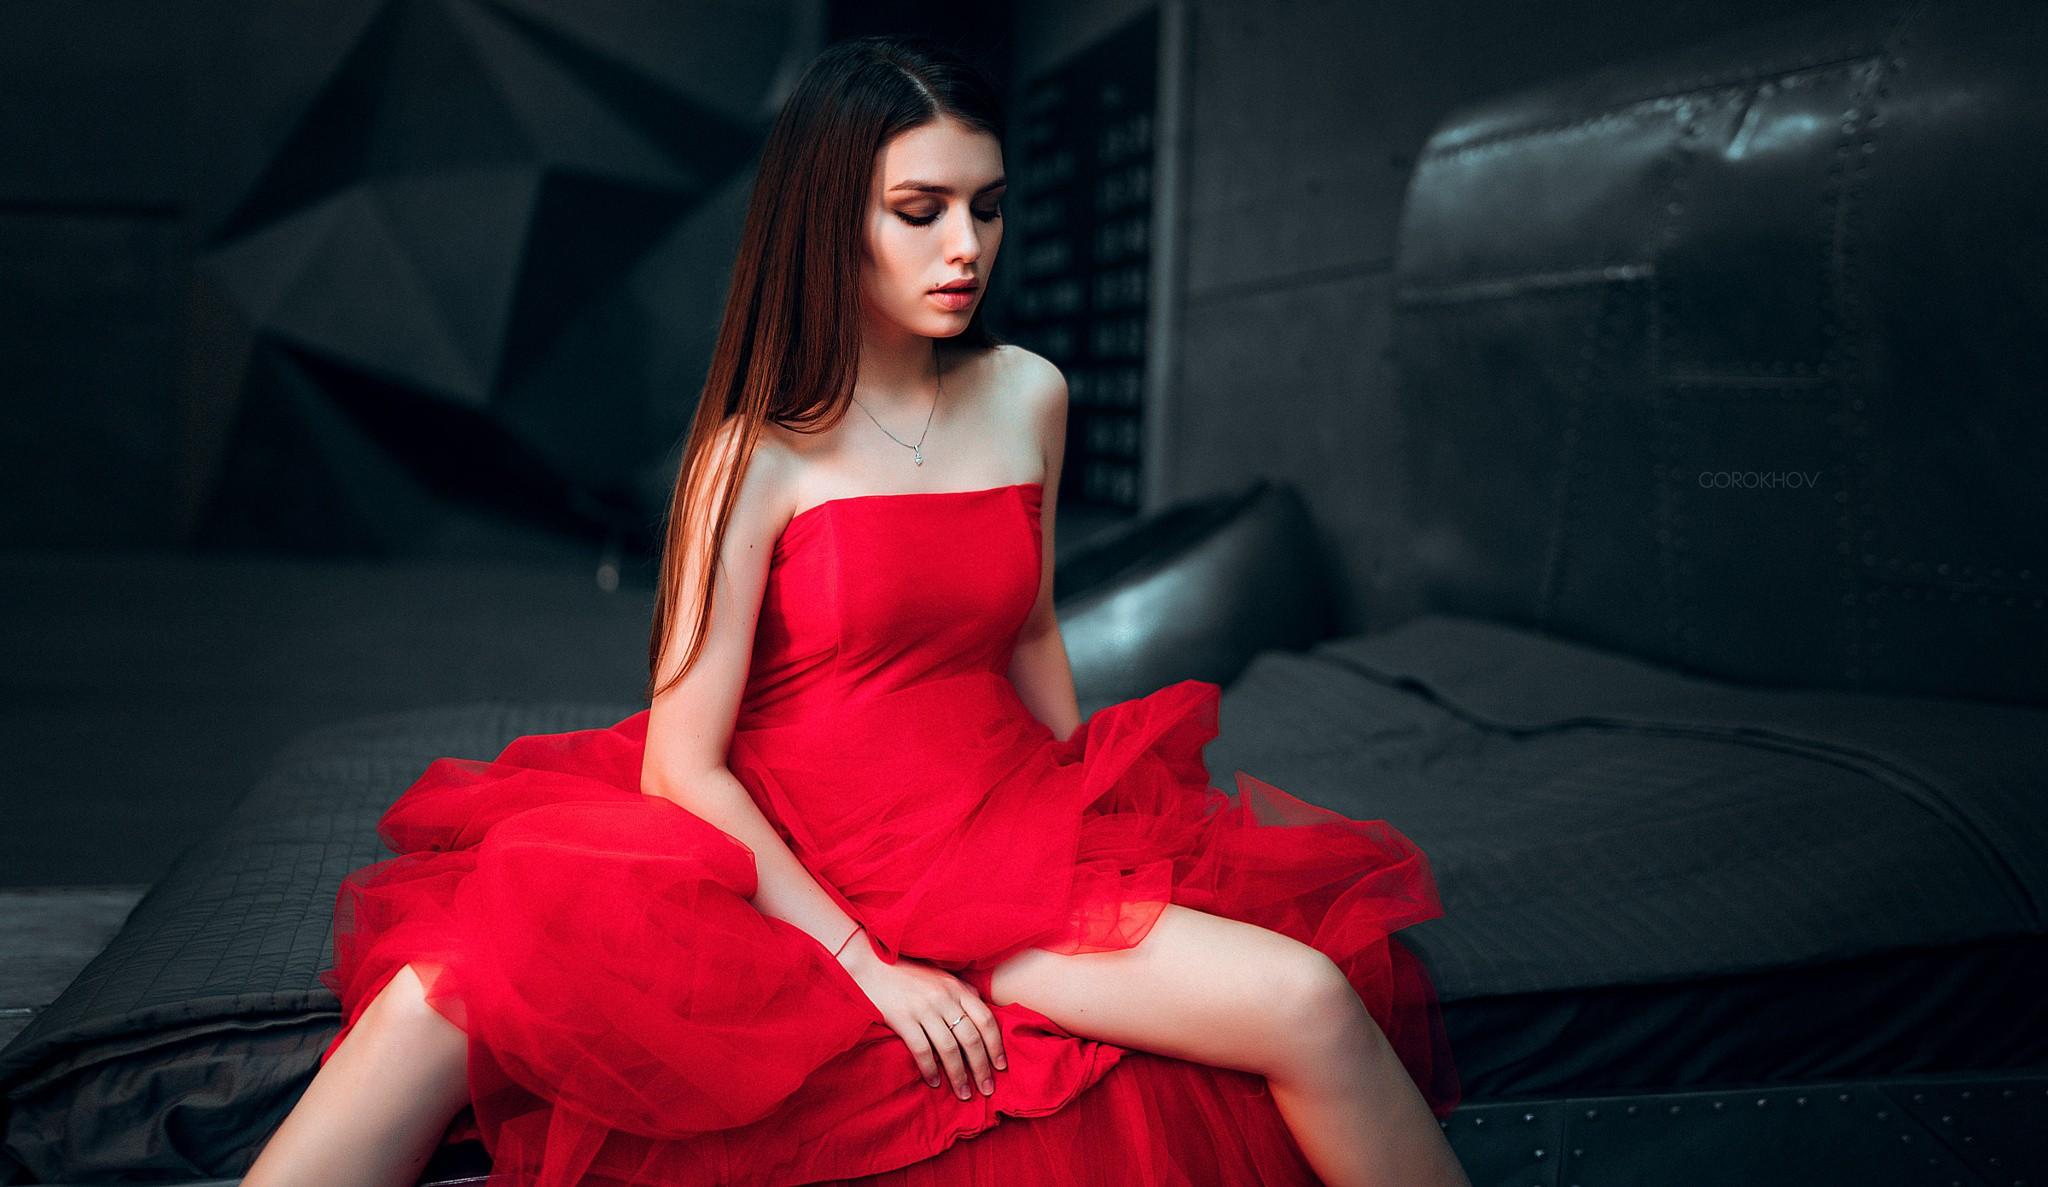 People 2048x1187 women Ivan Gorokhov model long hair brunette straight hair dress red dress legs bare shoulders Maria Way closed eyes